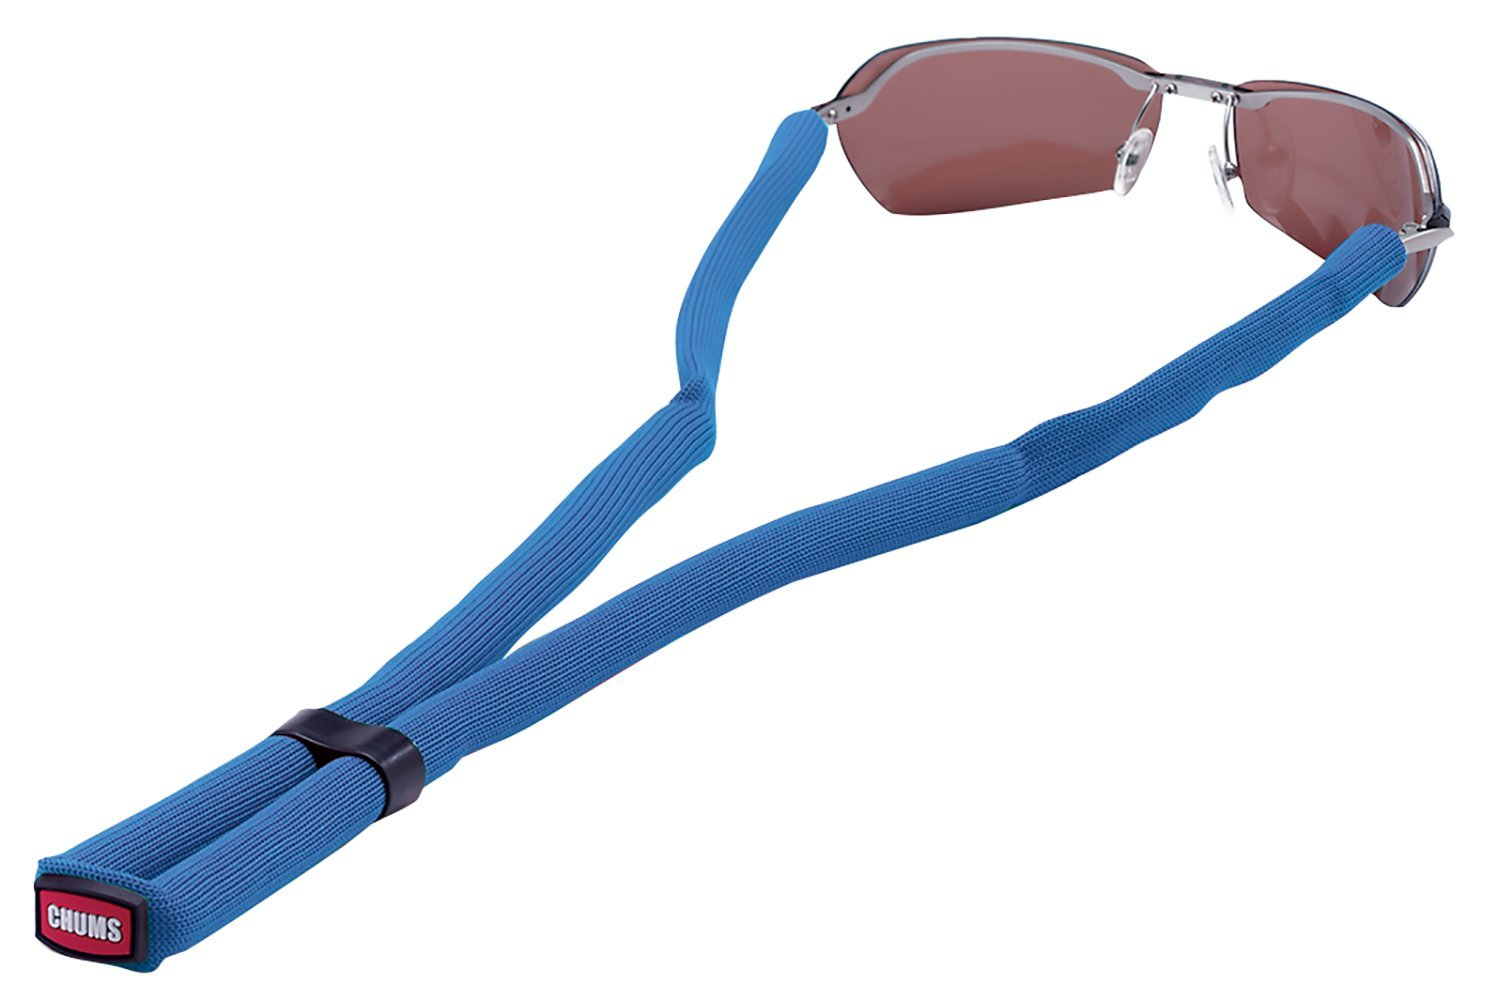 Chums Classic Glassfloats Eyewear Retainer, Royal